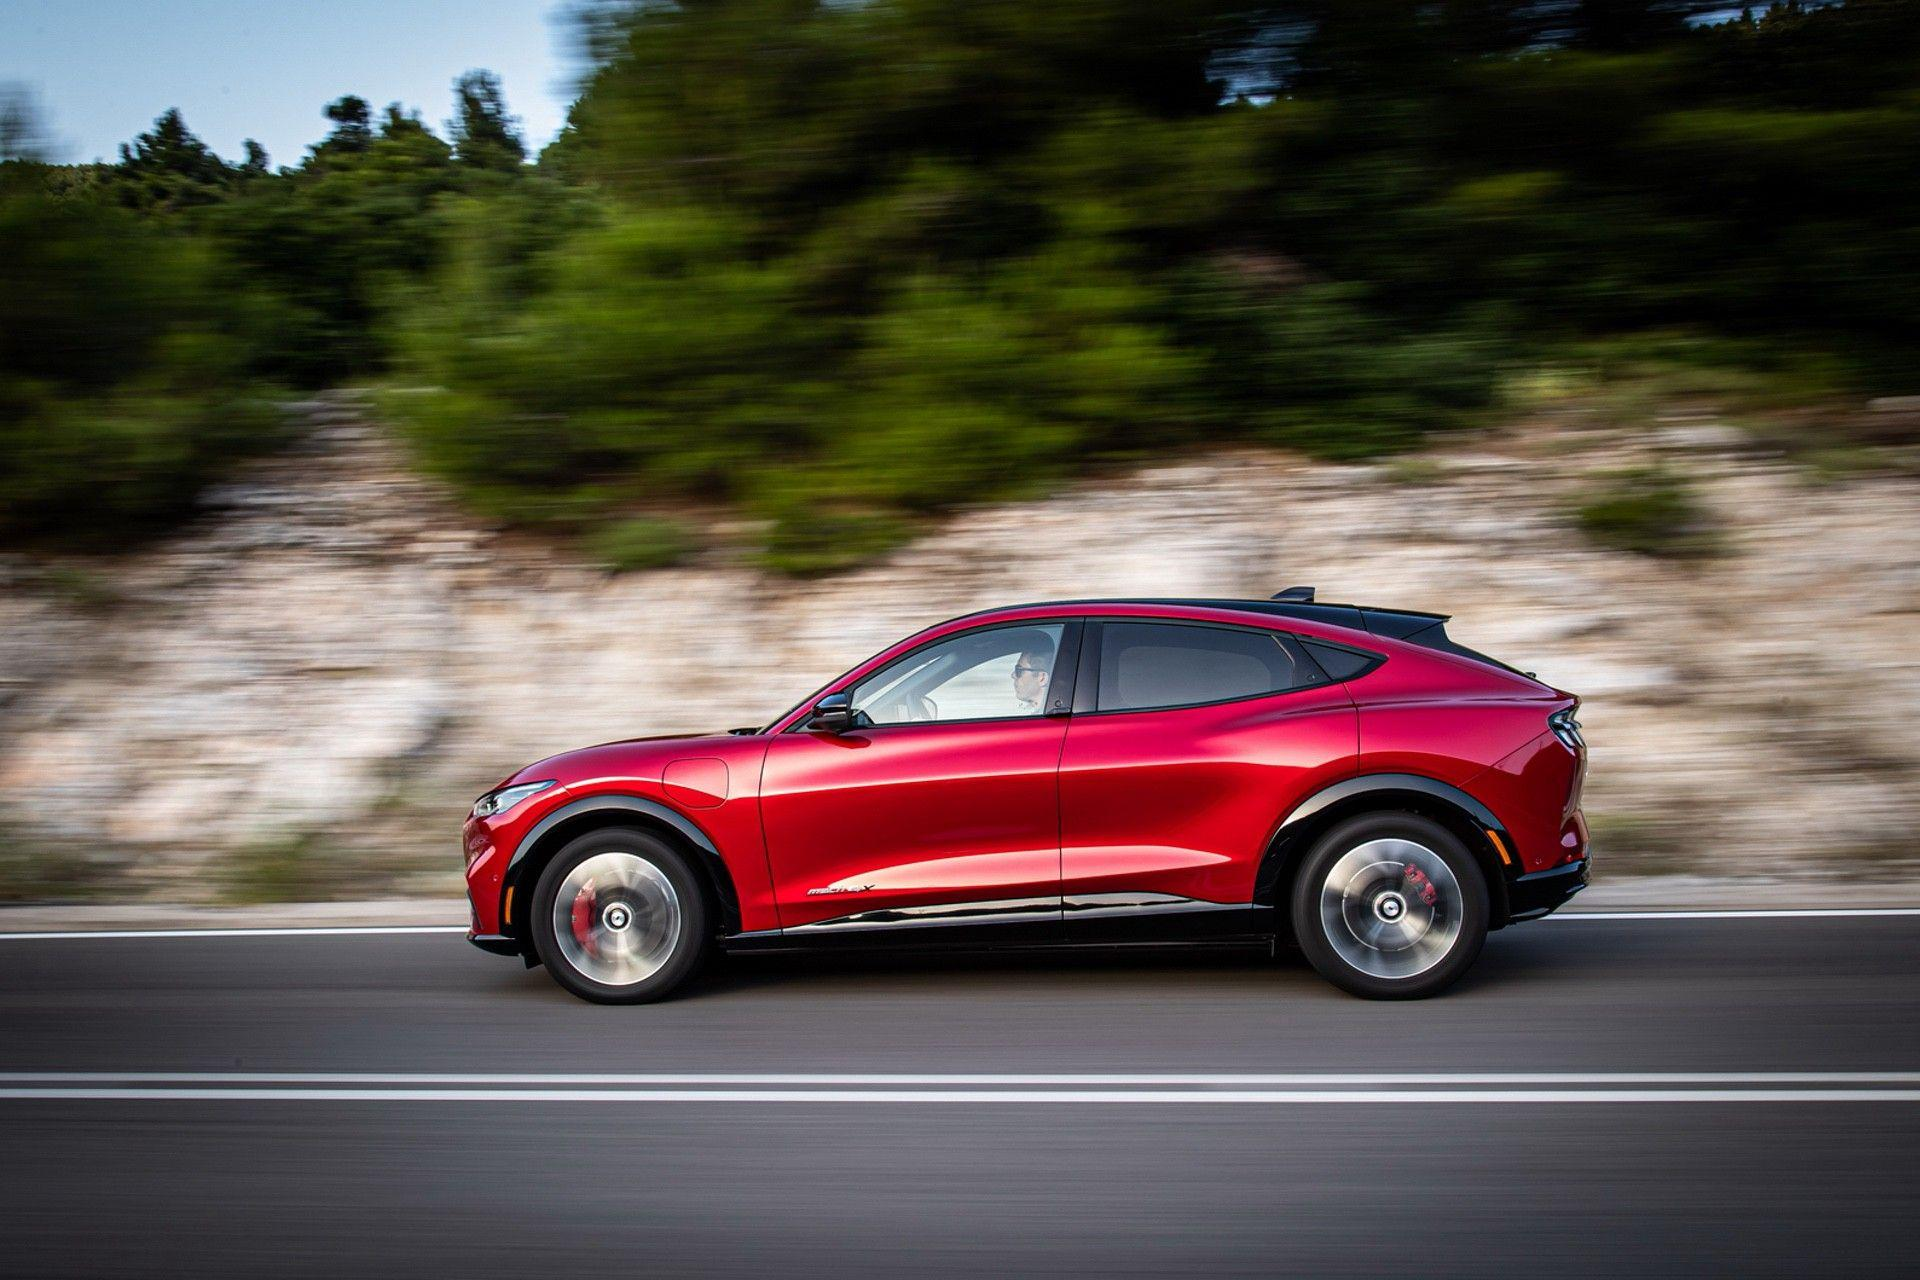 Ford_Mustang_Mach-E_greek_presskit-0101